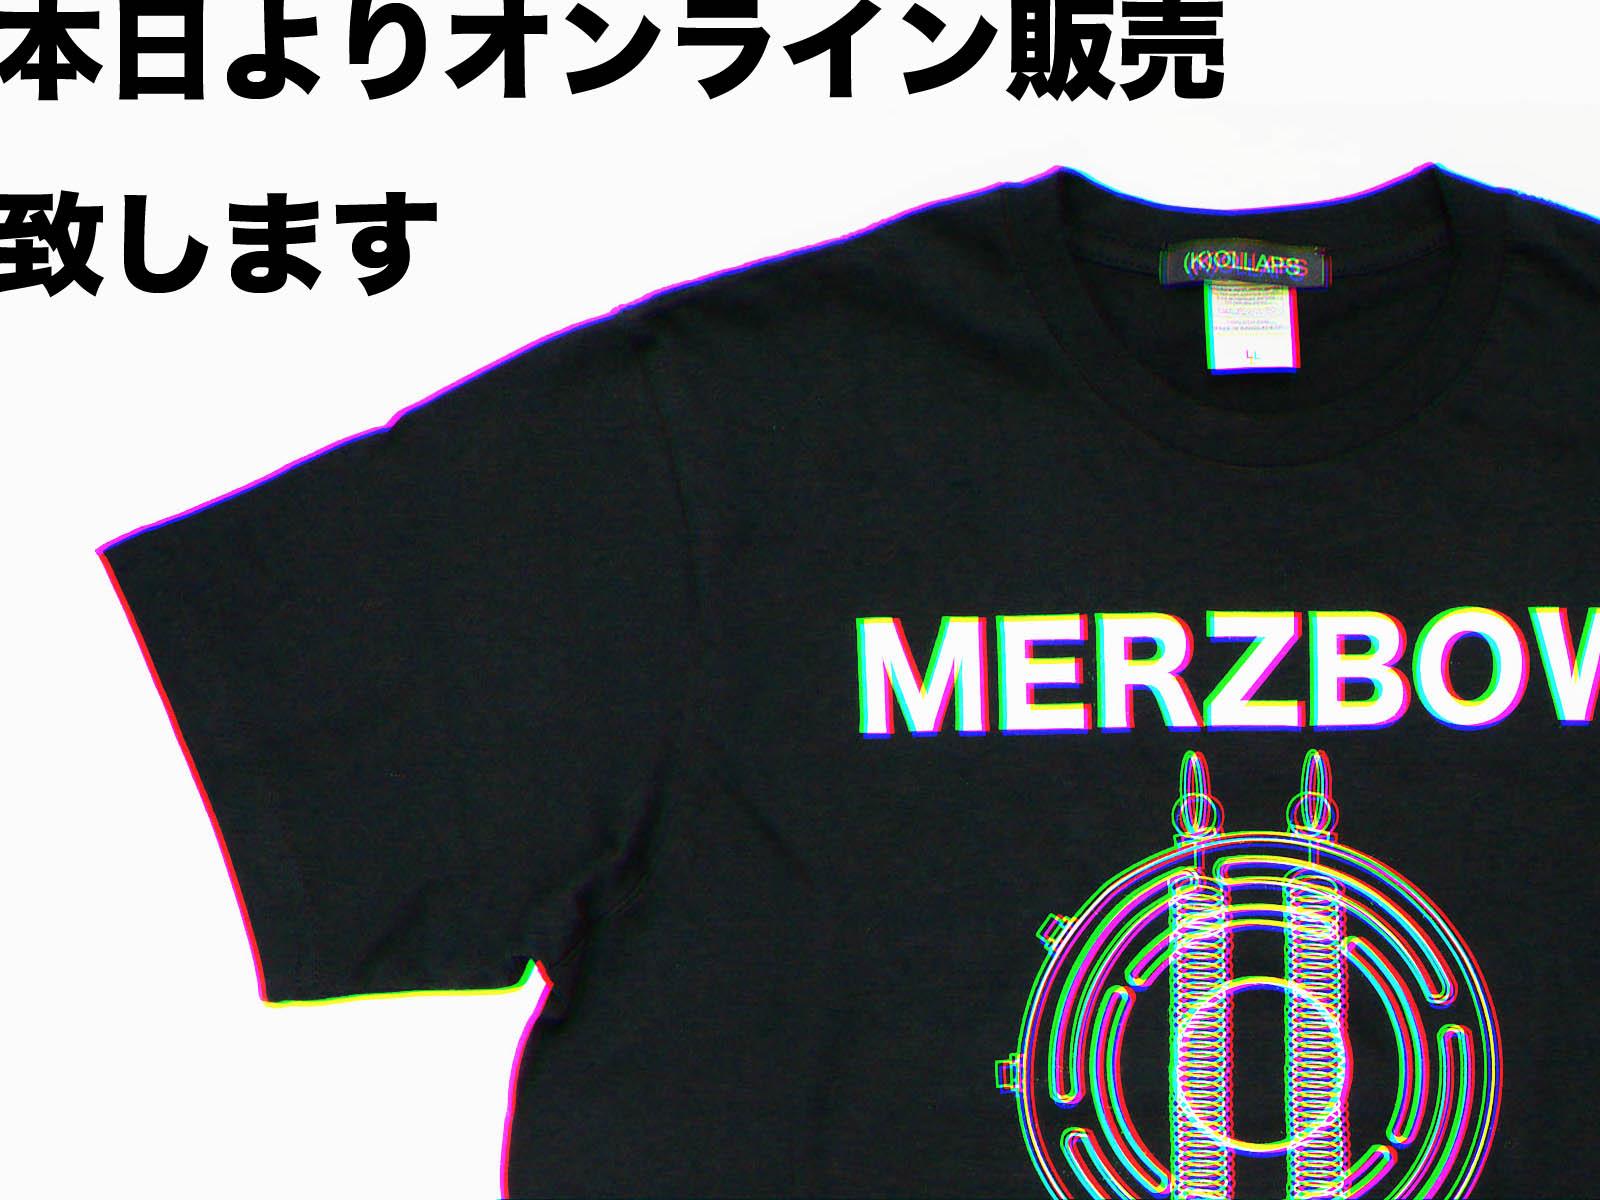 MERZBOW×(K)OLLAPS オンラインにて発売開始しました